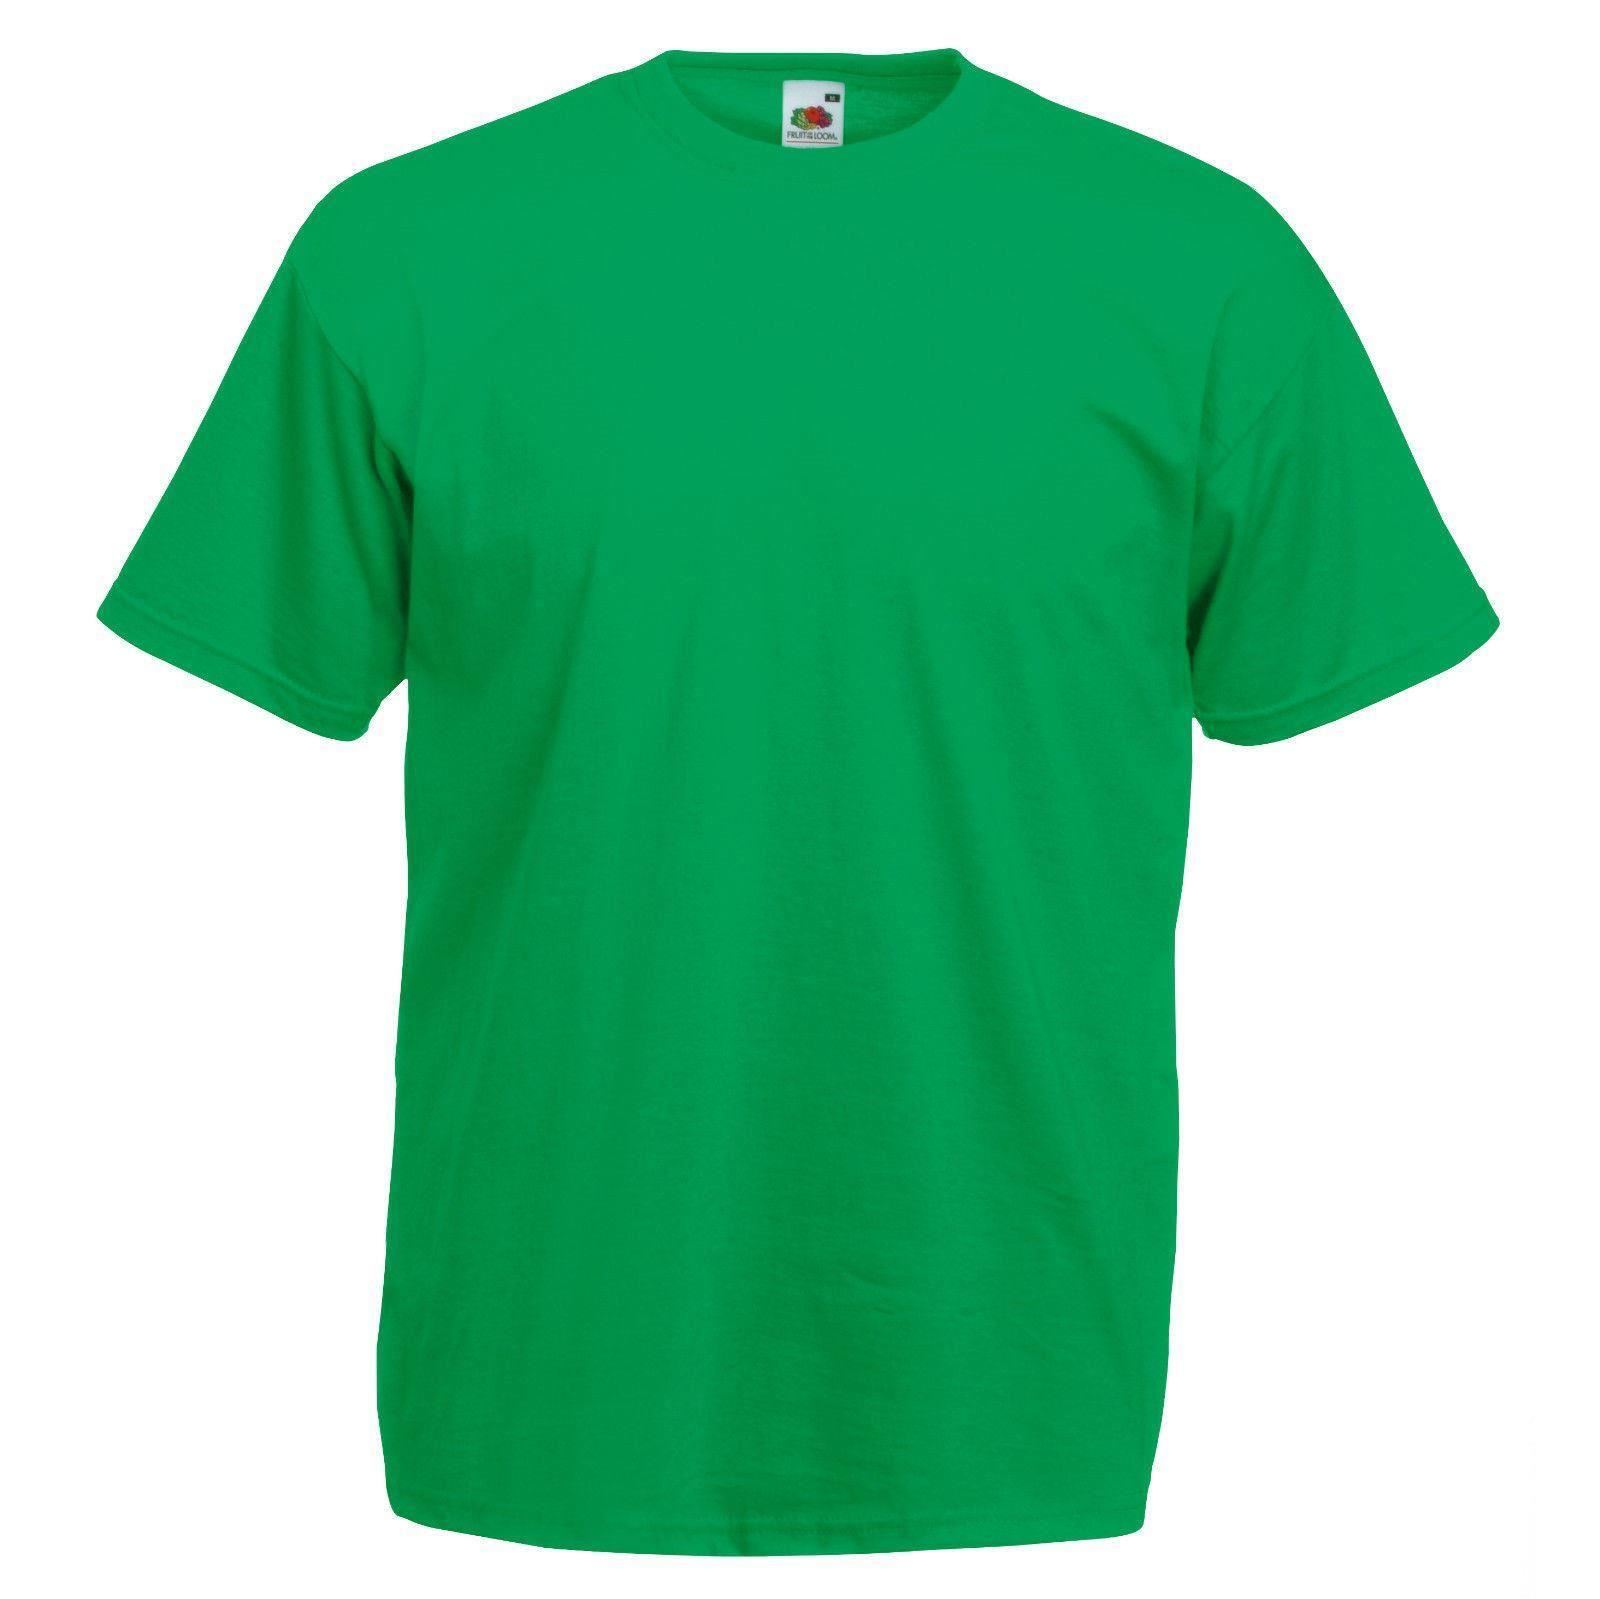 Kelly green fruit of the loom mens soft spun t shirt plain for Green mens t shirt